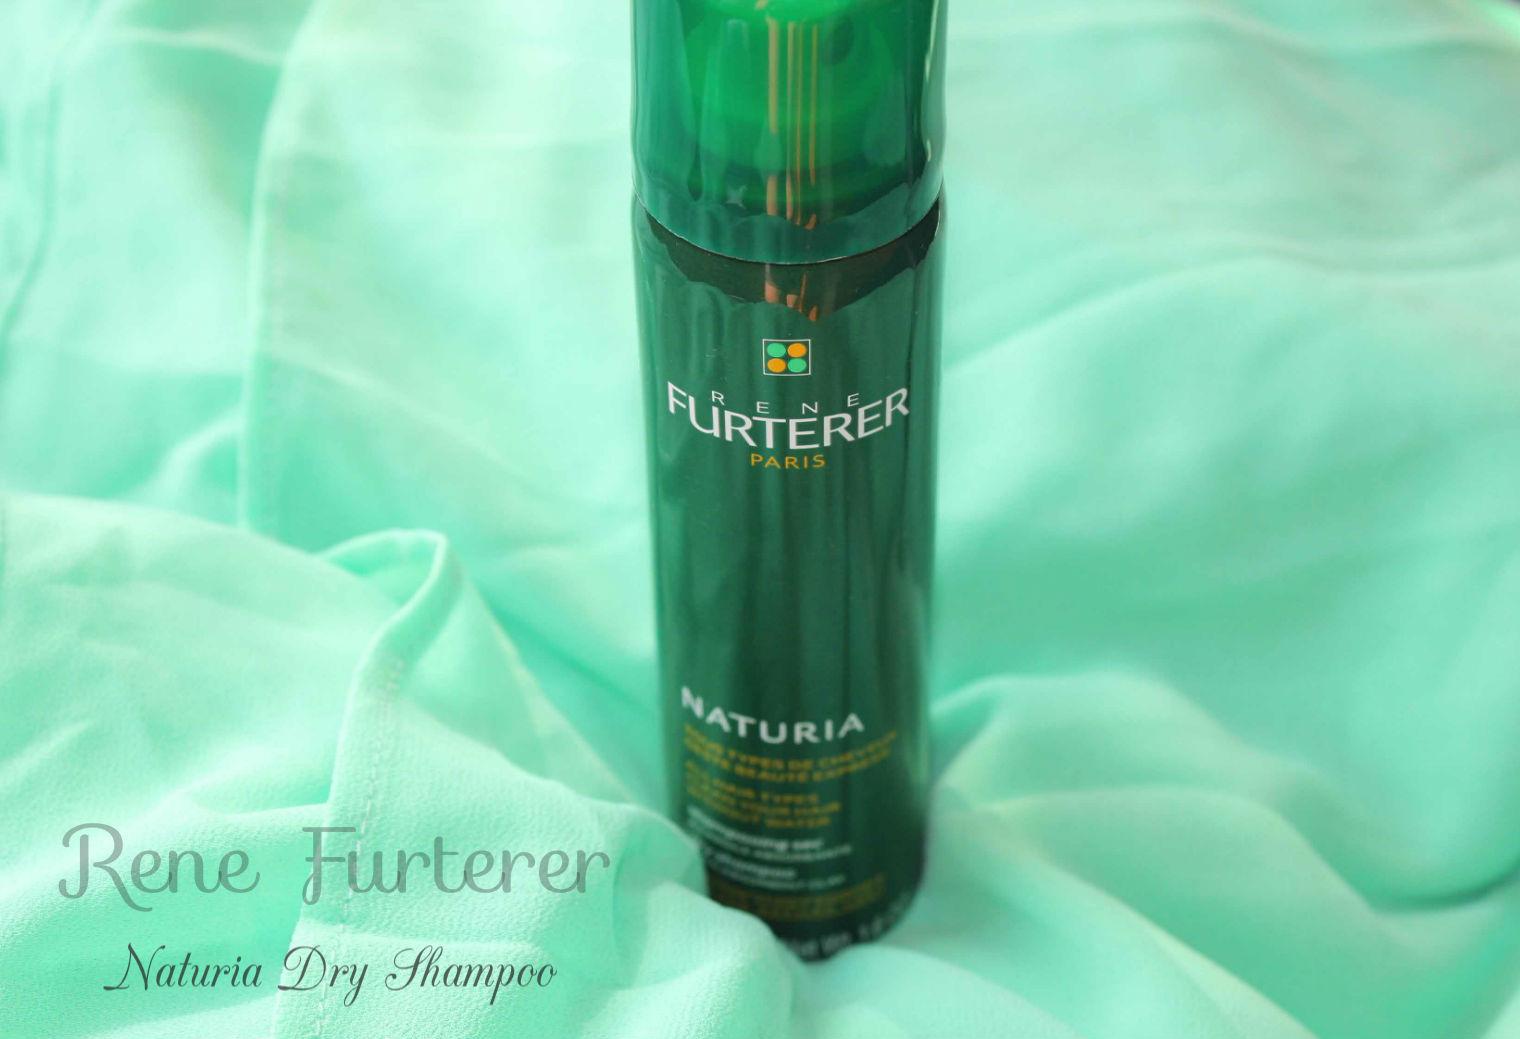 Отзыв: Сухой шампунь Натурия - Rene Furterer Naturia Dry Shampoo.